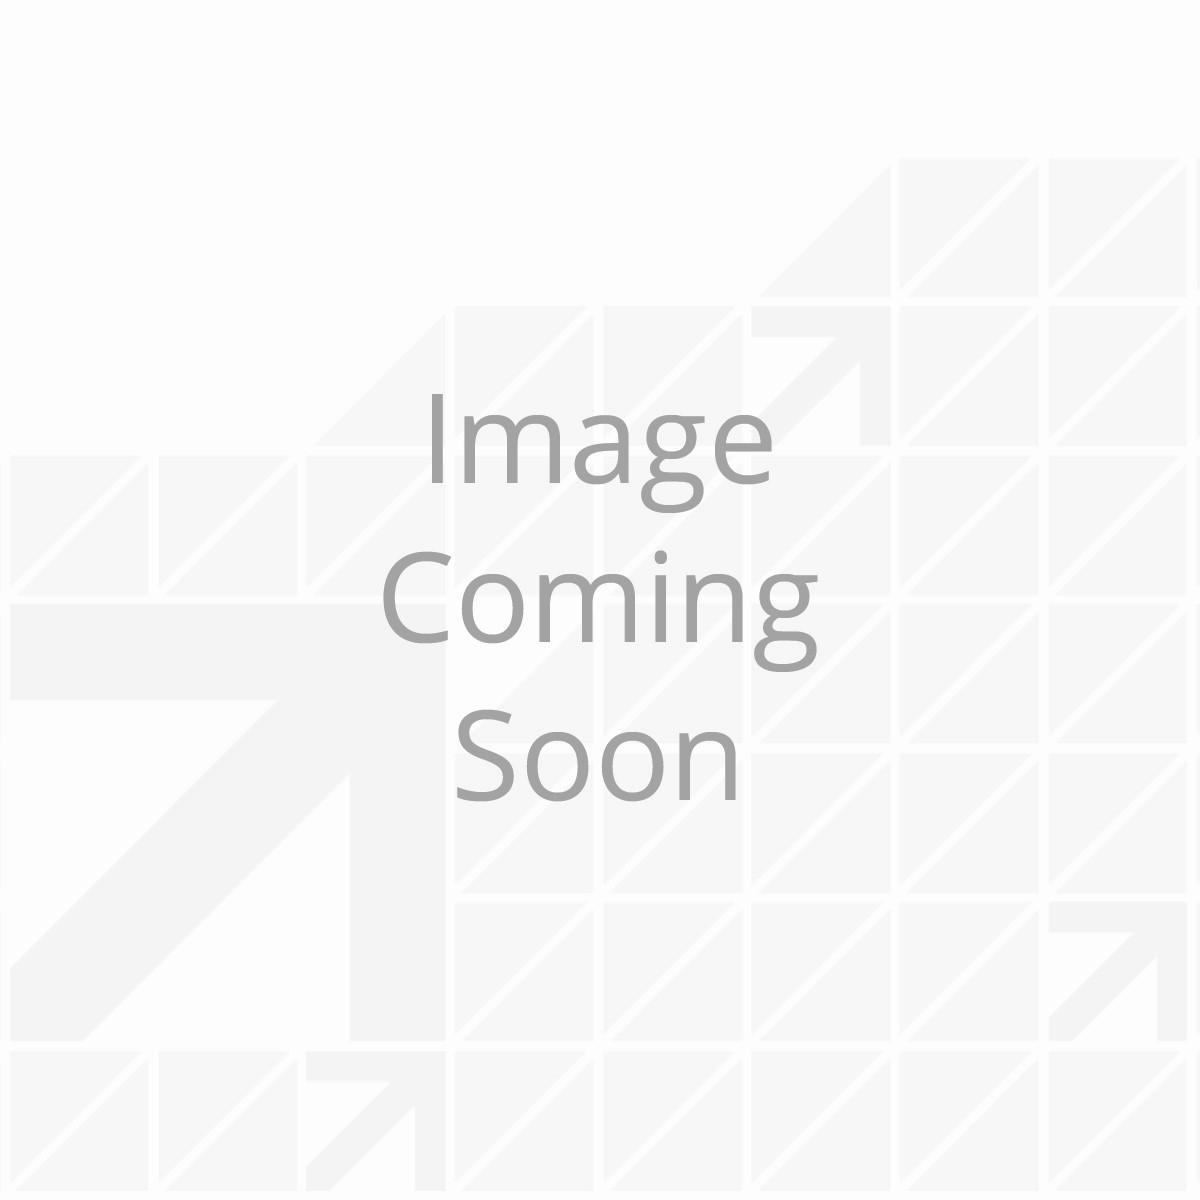 "5"" x 3-1/4"" x 3-7/8"" Lockable Breakaway Battery Case with Metal Bracket"